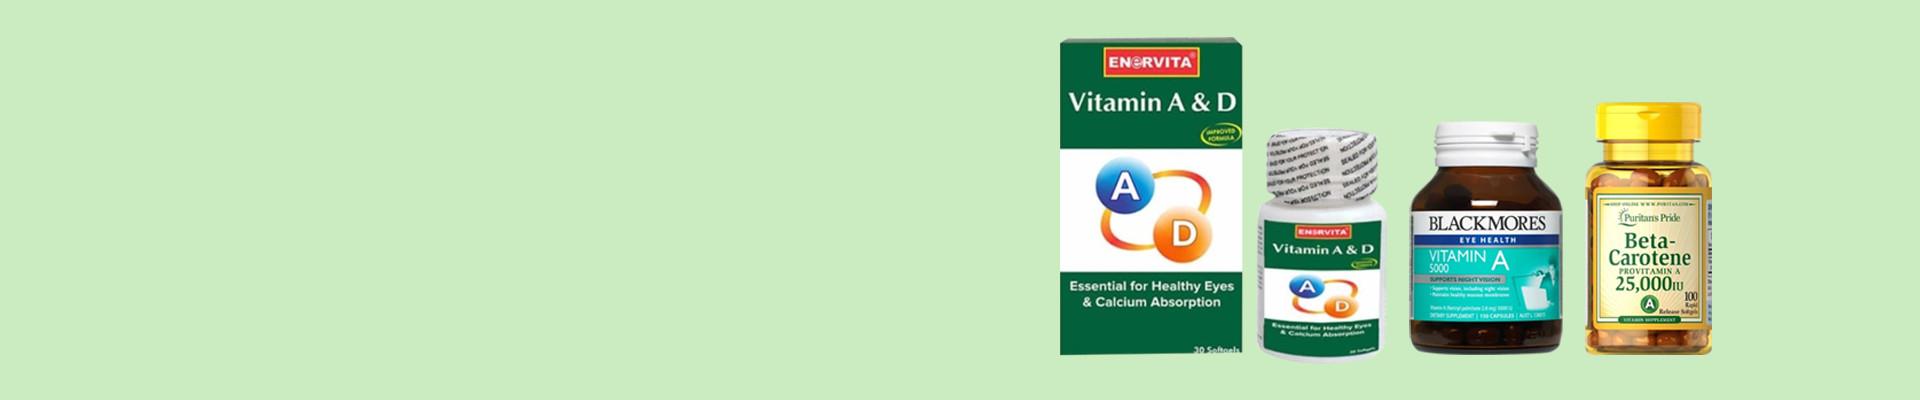 Jual Vitamin A Online - Multivitamin Terlengkap